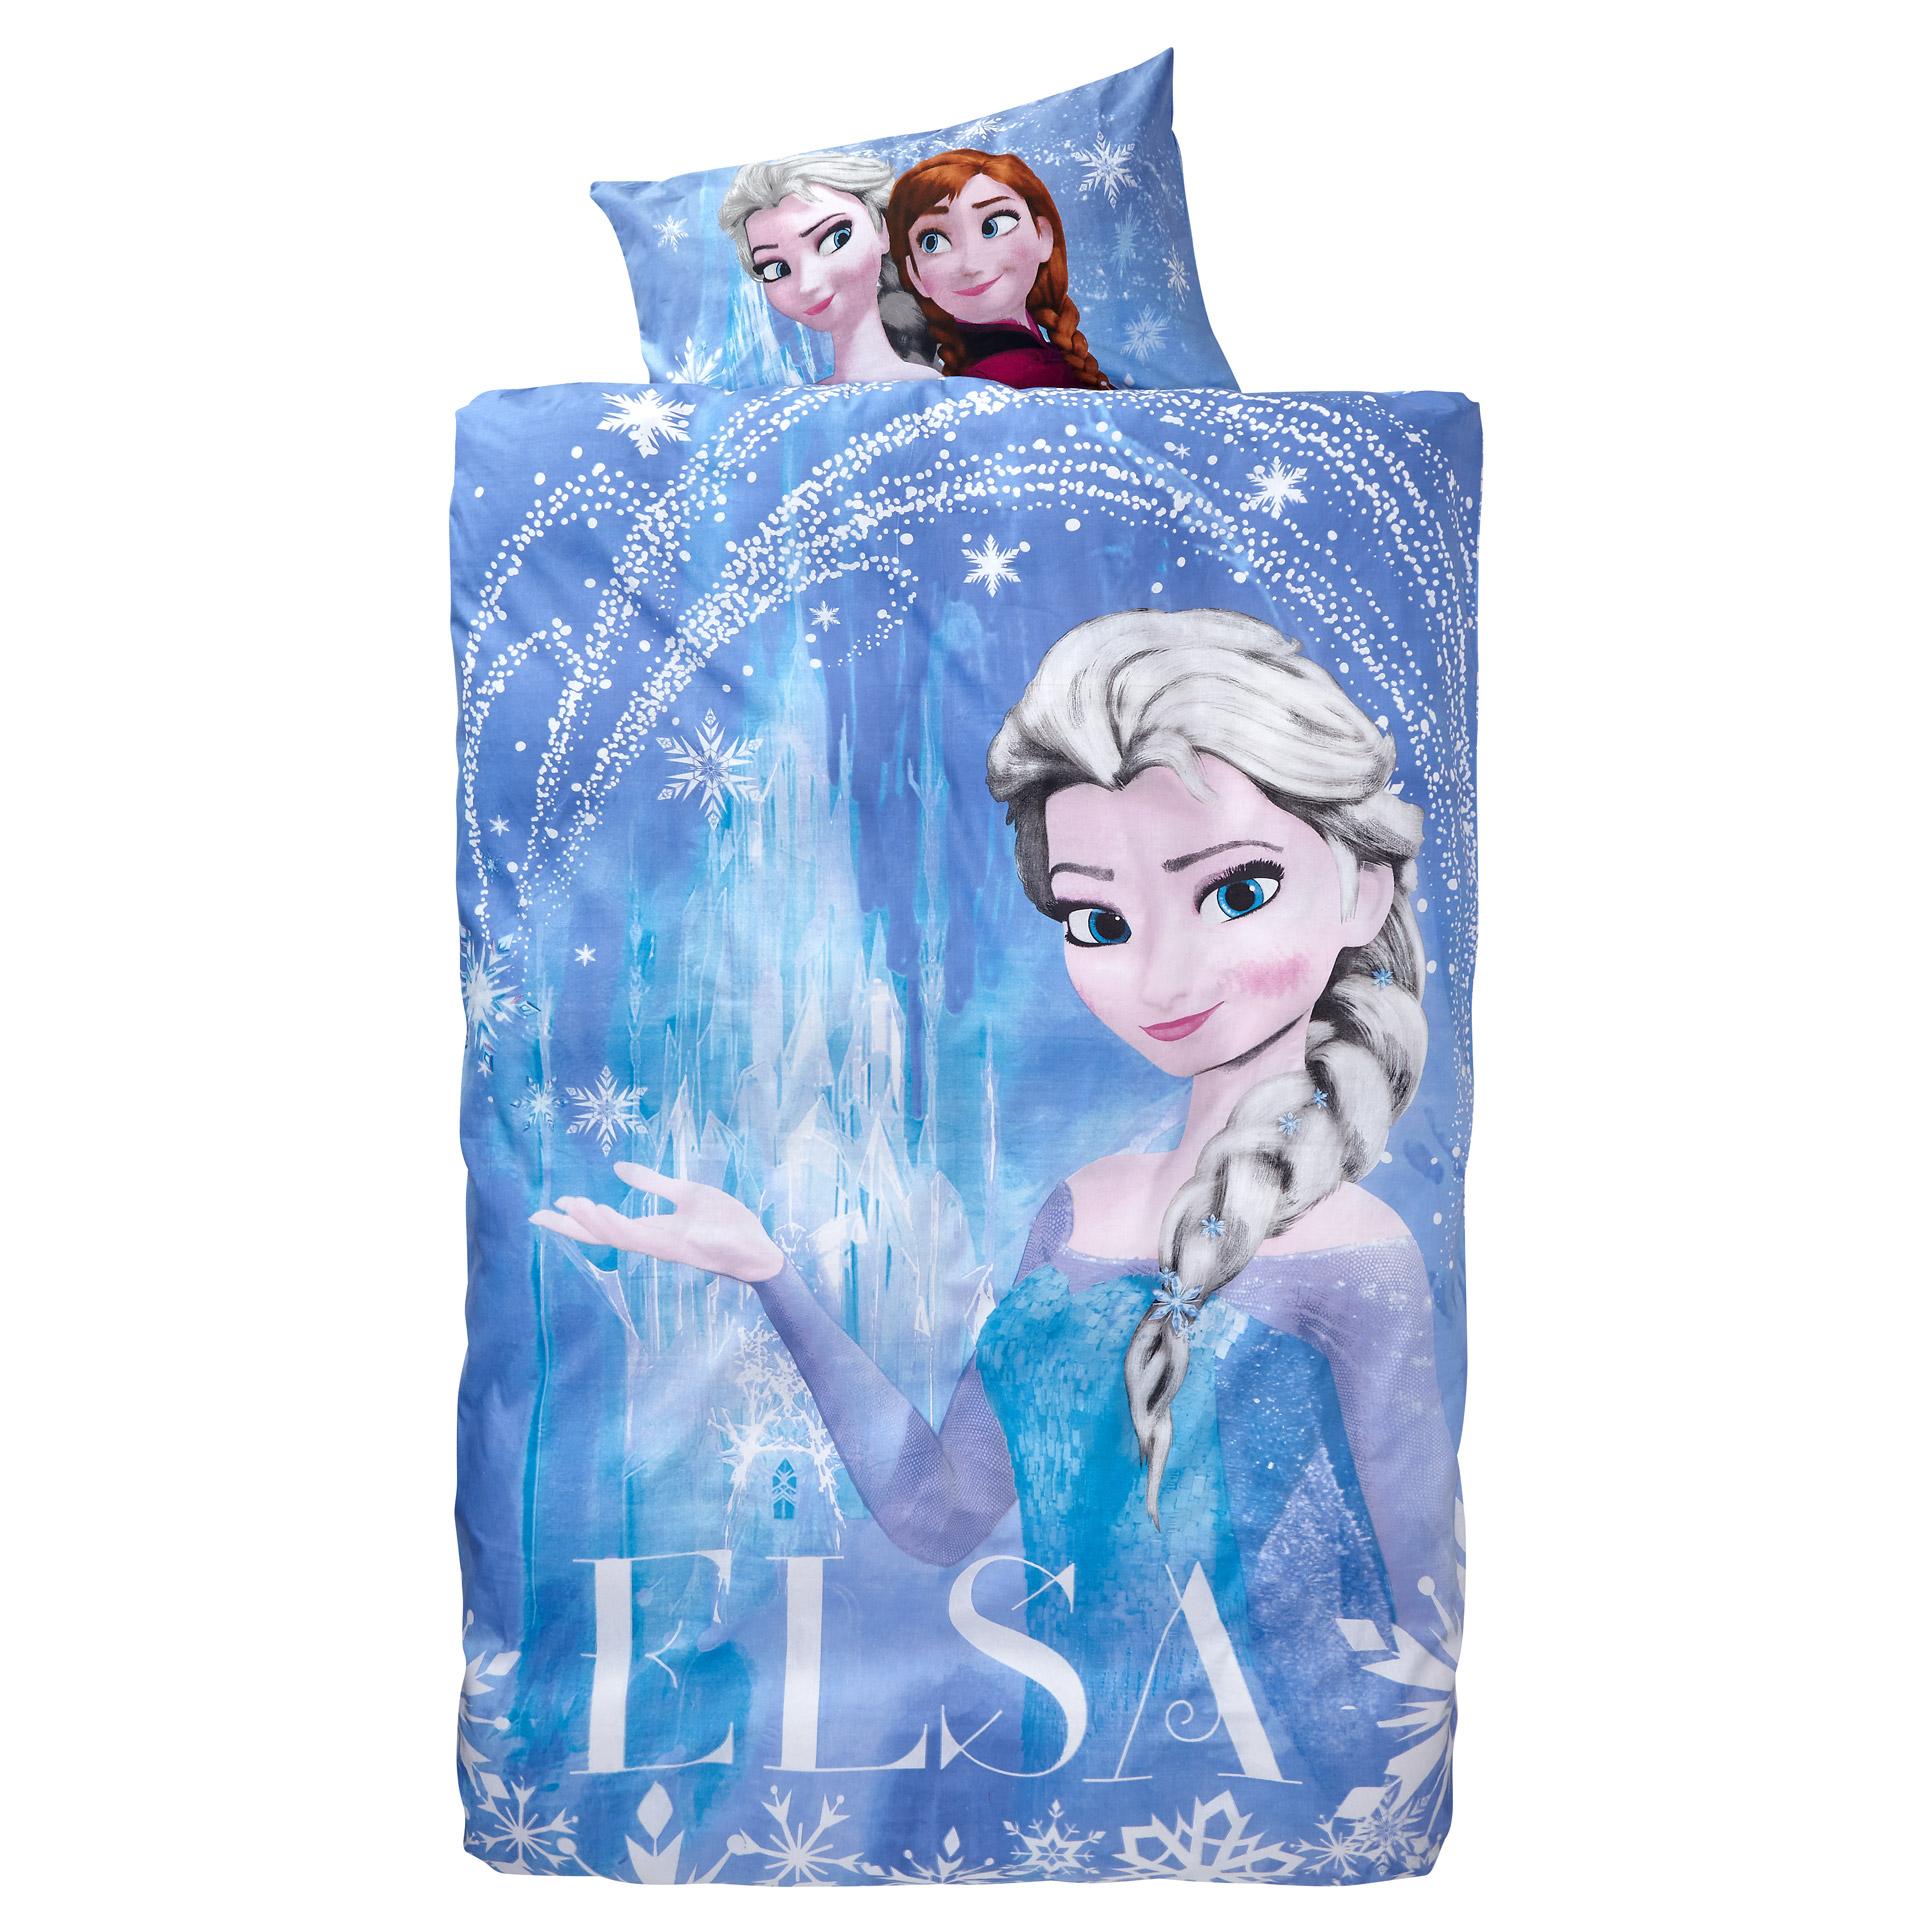 Kinderbettwäsche Eiskönigin Elsa (135x200)